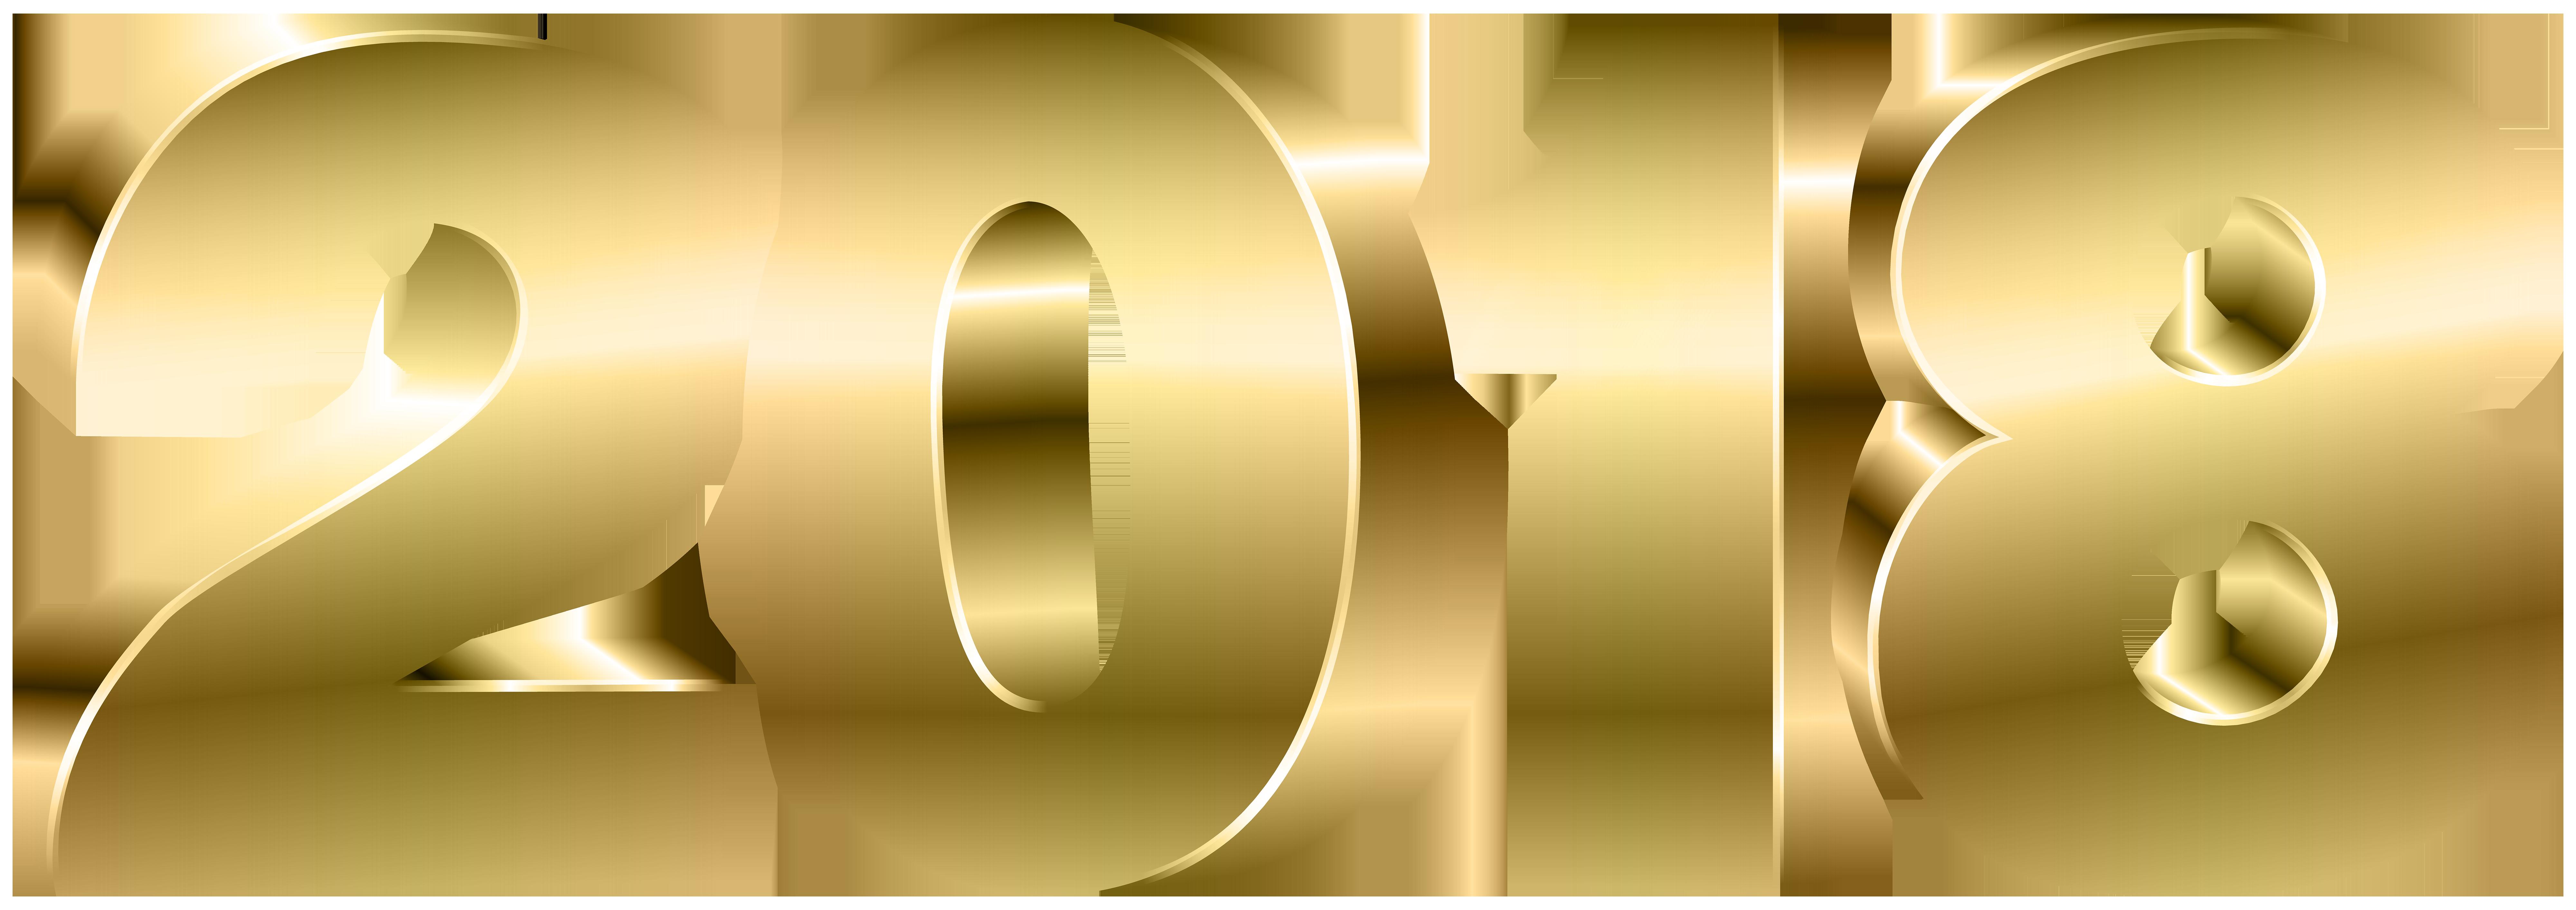 gold png image. 2018 clipart transparent background